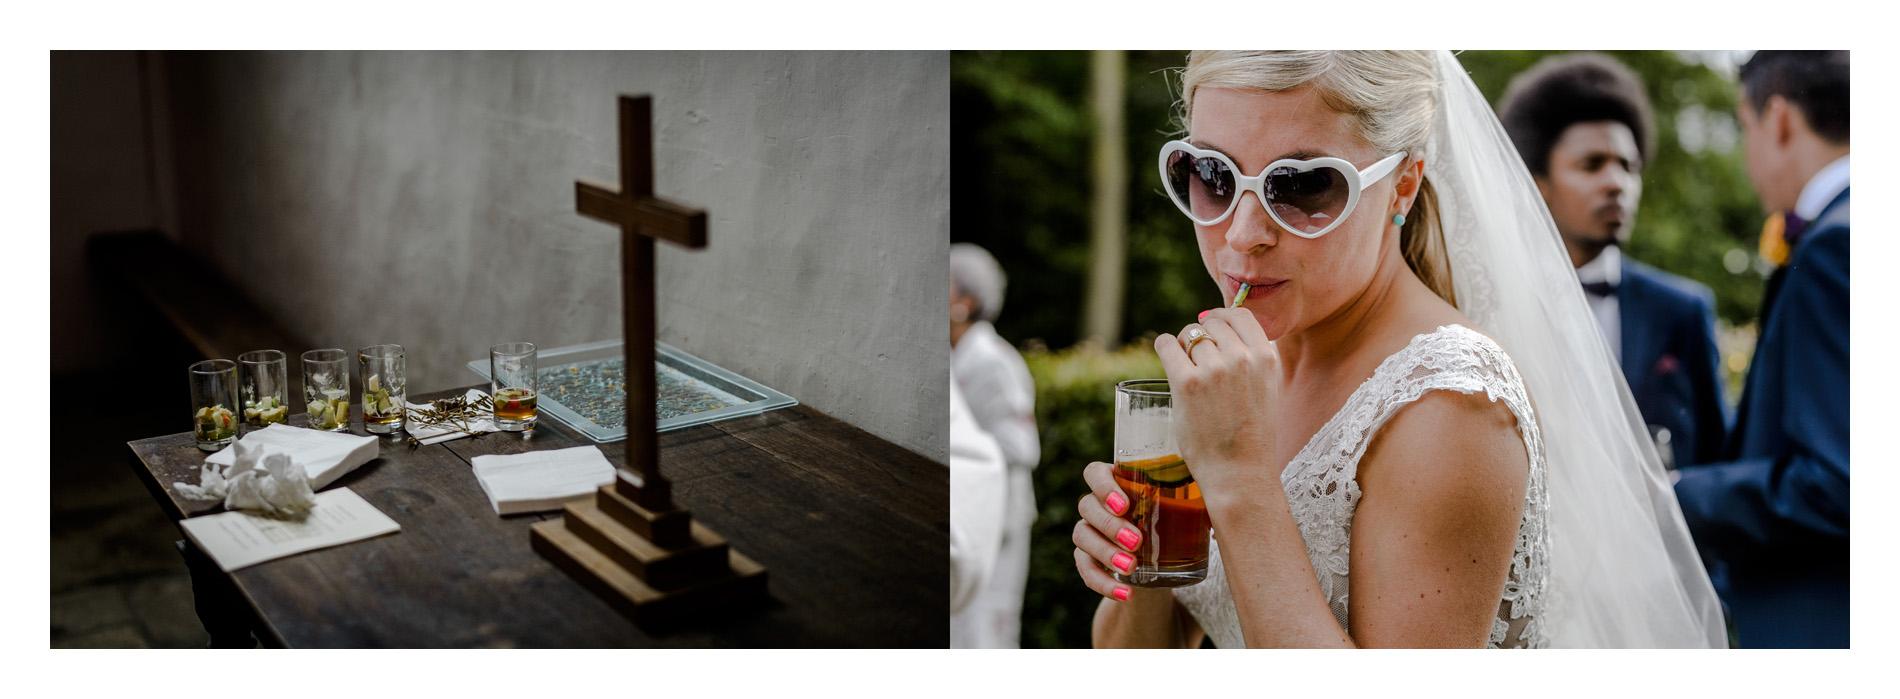 Wedding-Pairs-0016.jpg